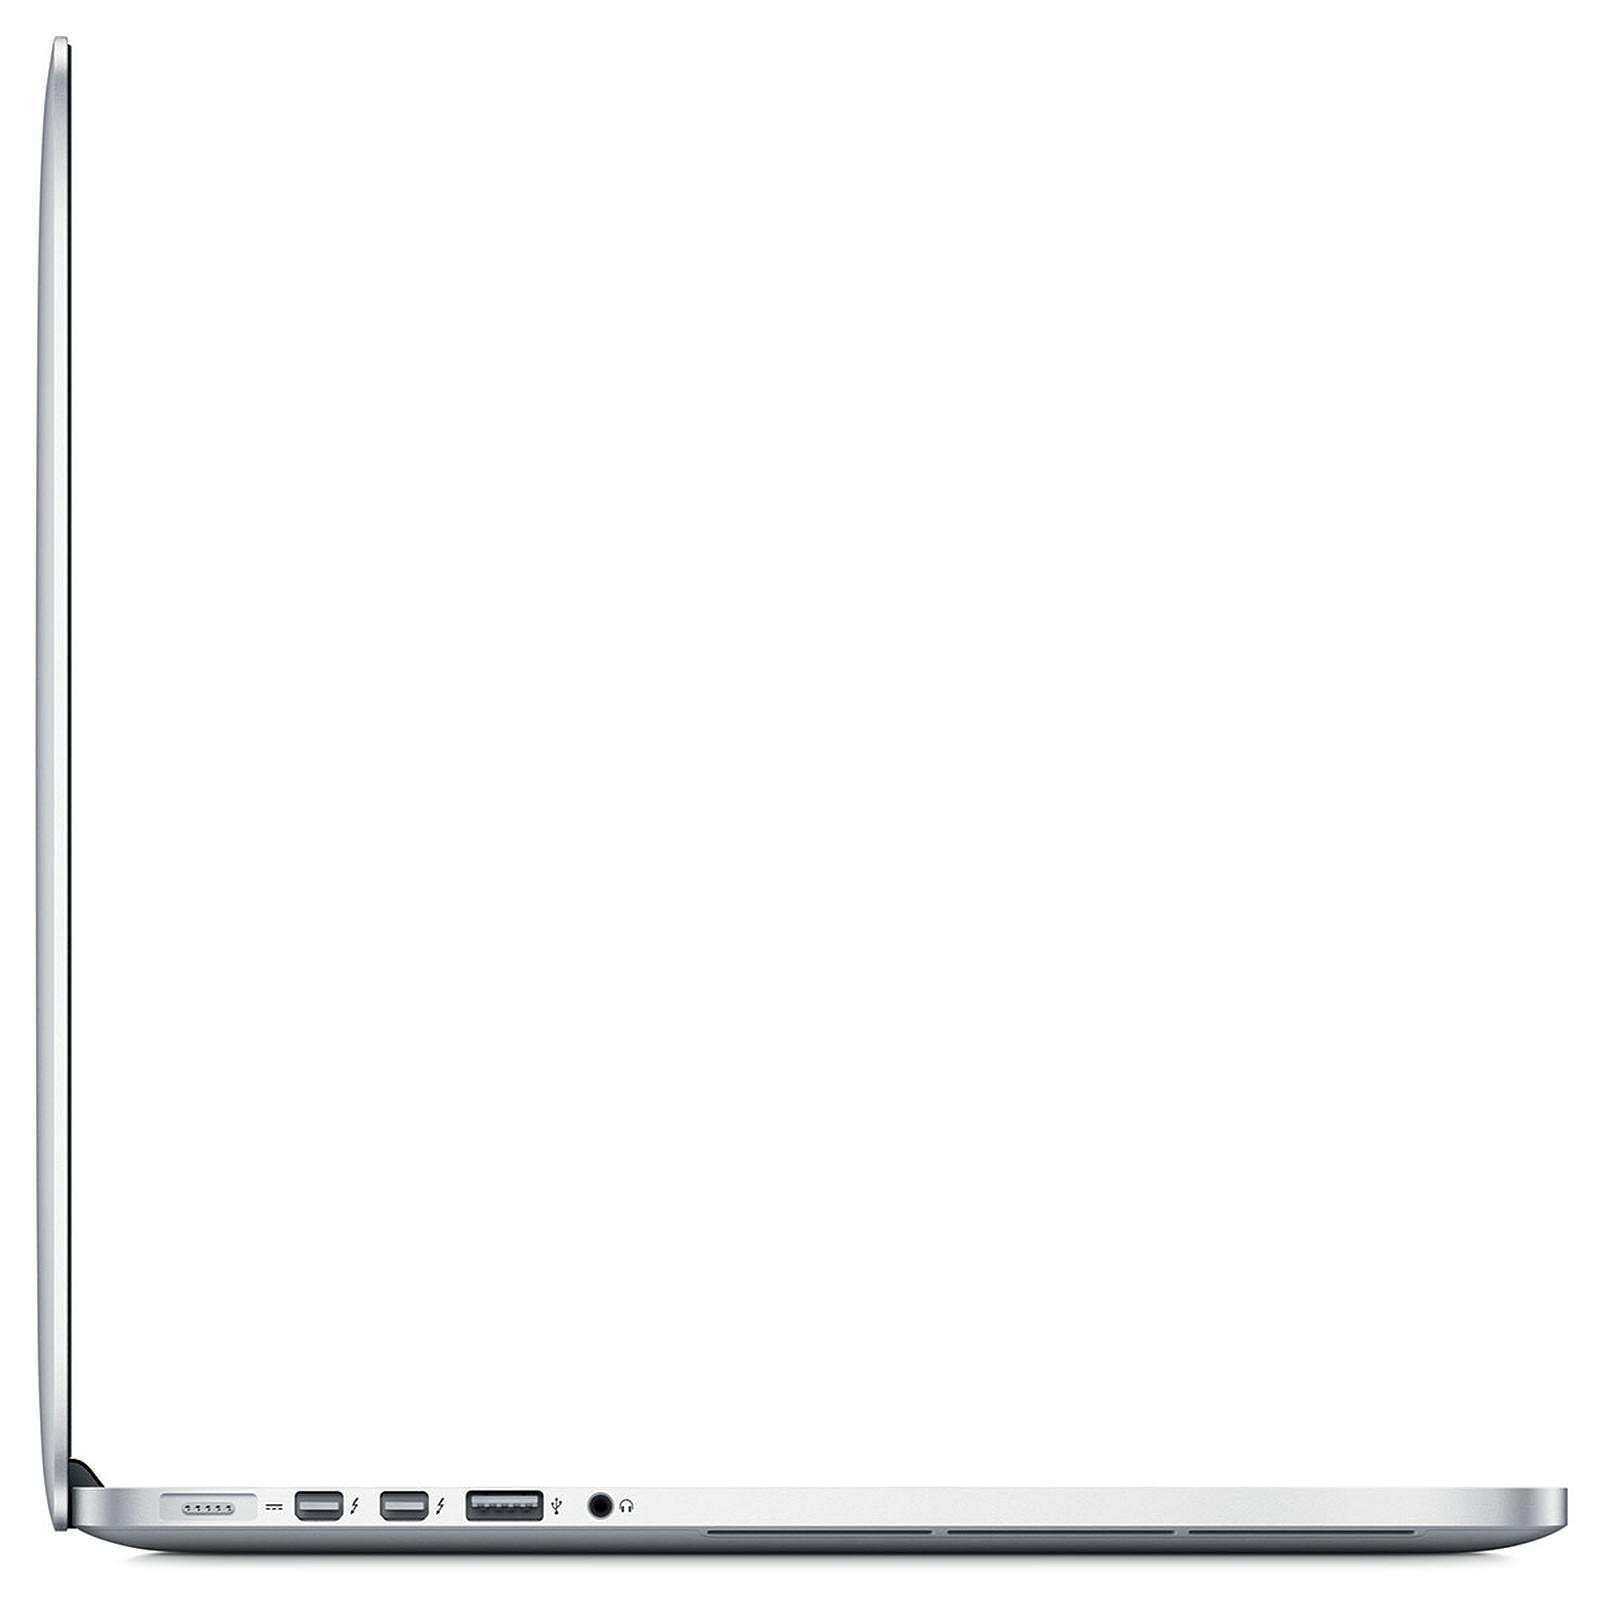 MacBook Pro Retina 15.4-inch (2013) - Core i7 - 16GB - SSD 512 GB QWERTY - English (US)